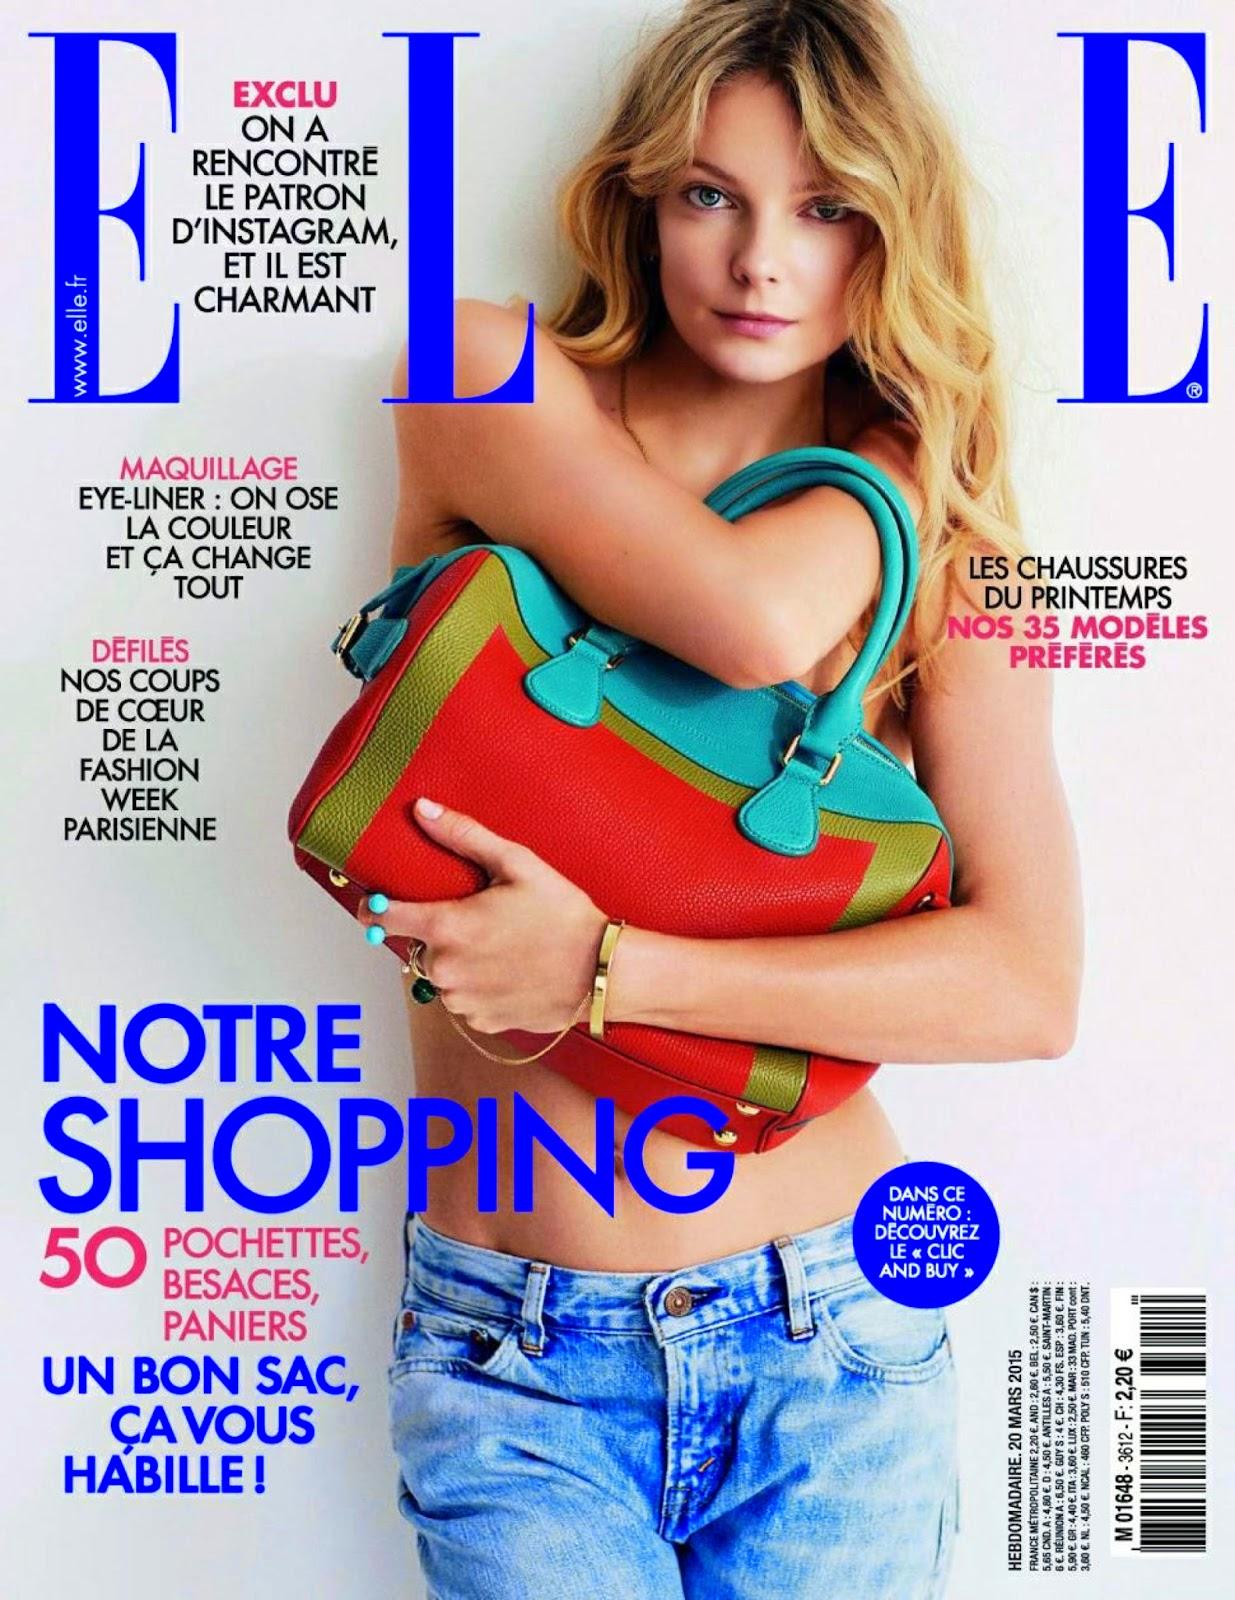 Fashion Model @ Eniko Mihalik by Matt Jones for ELLE France March 2015